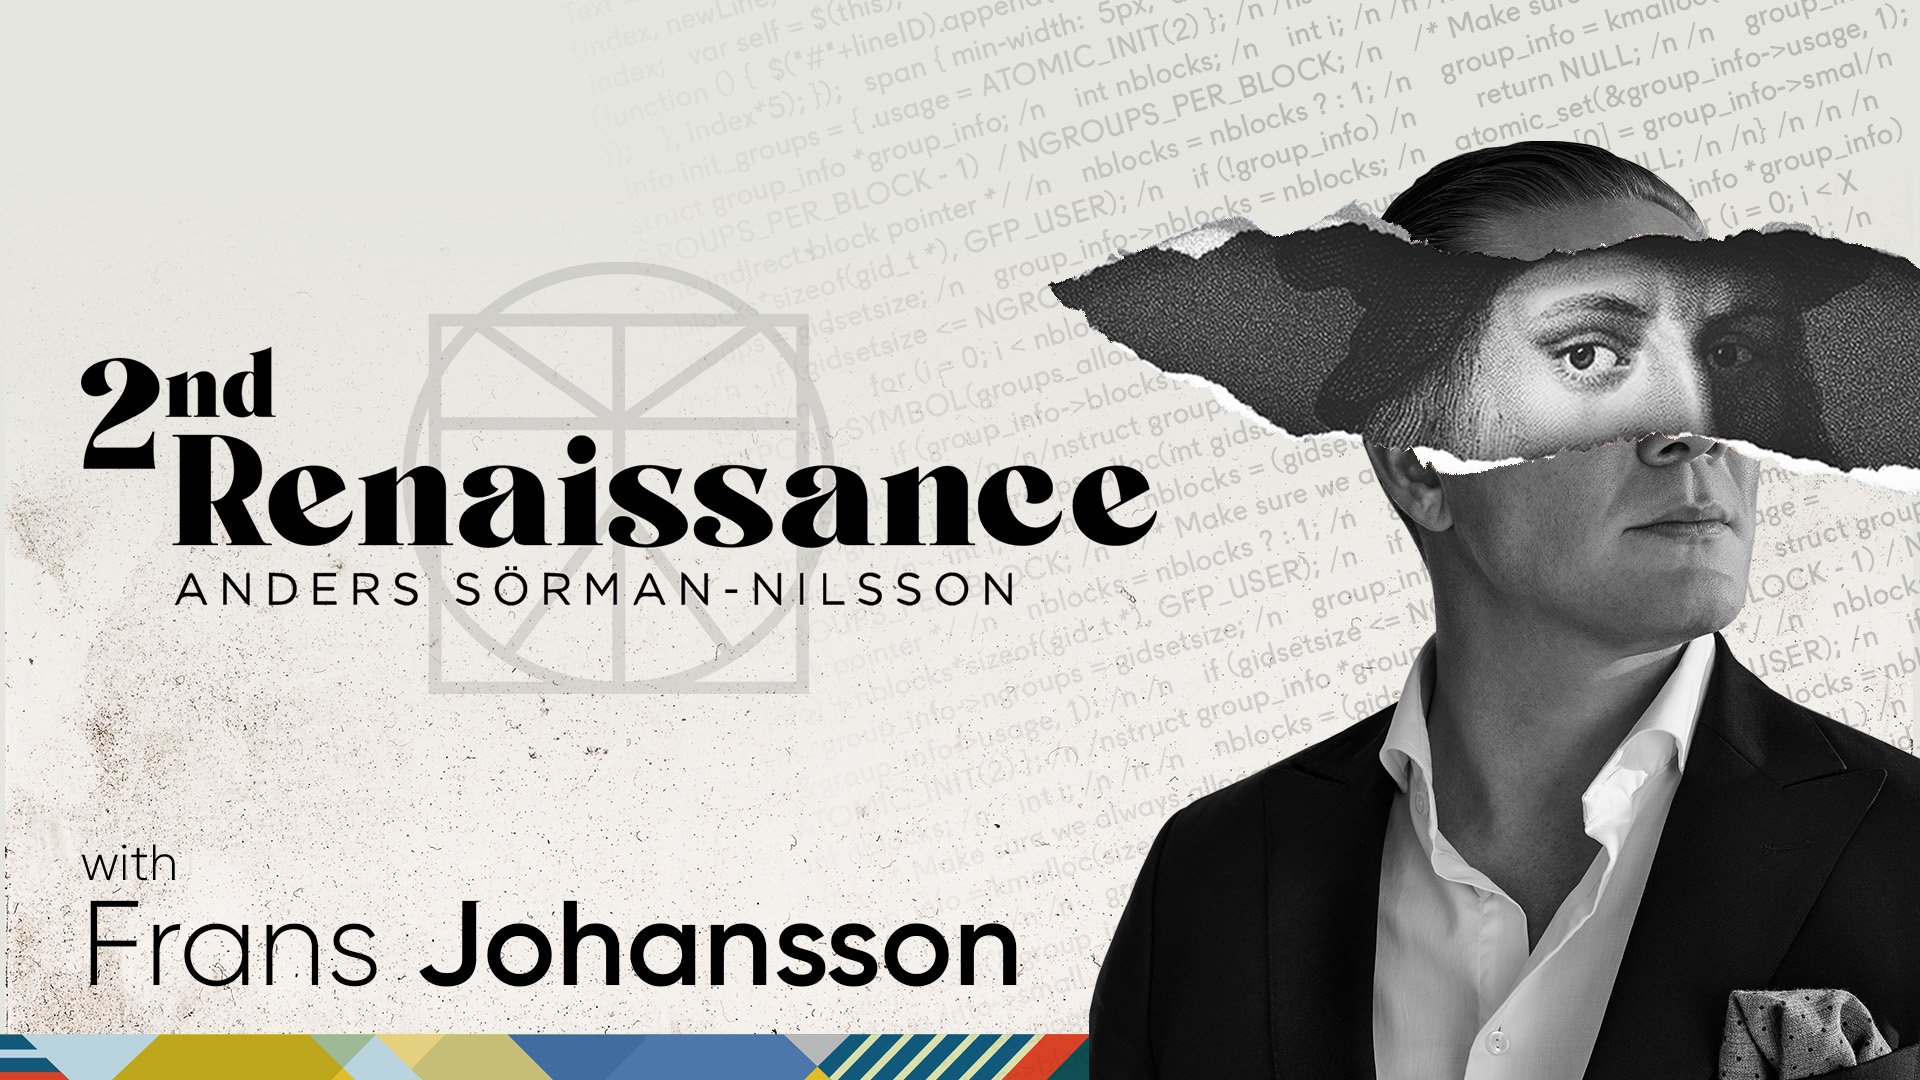 2nd Renaissance Frans Johansson featuring Futurist Anders Sörman-Nilsson